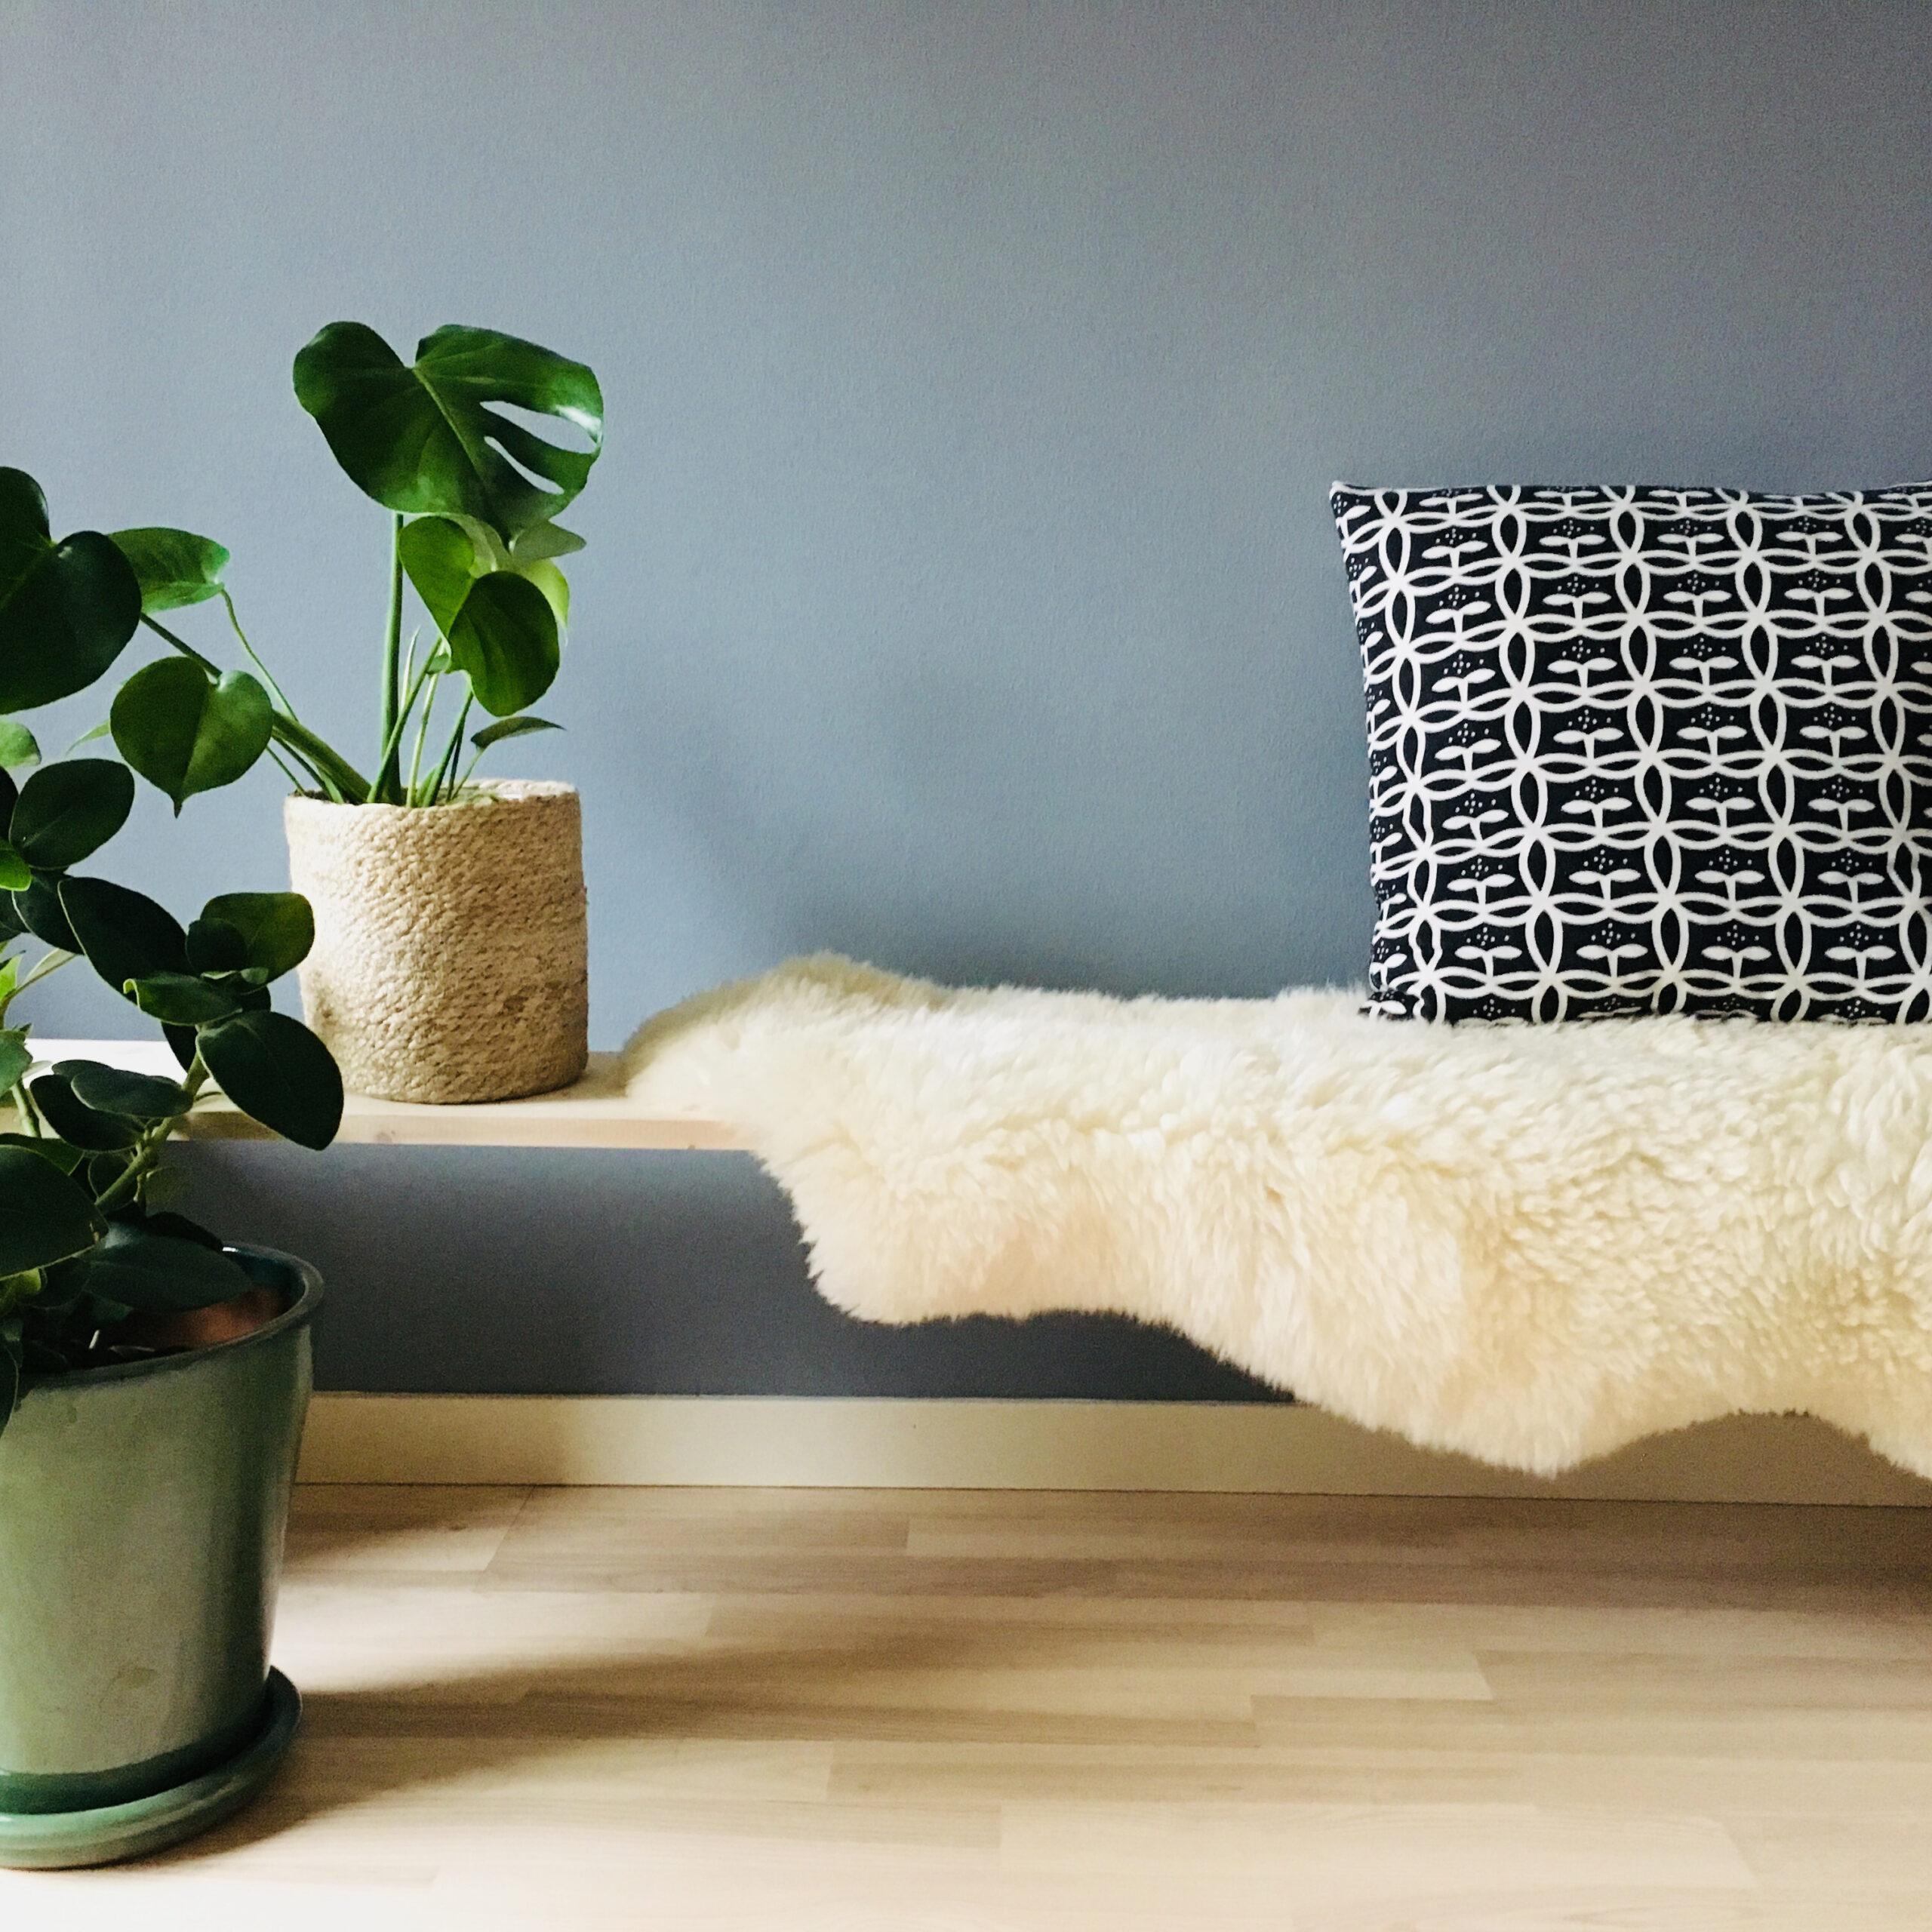 Textildesign Emma Anderberg